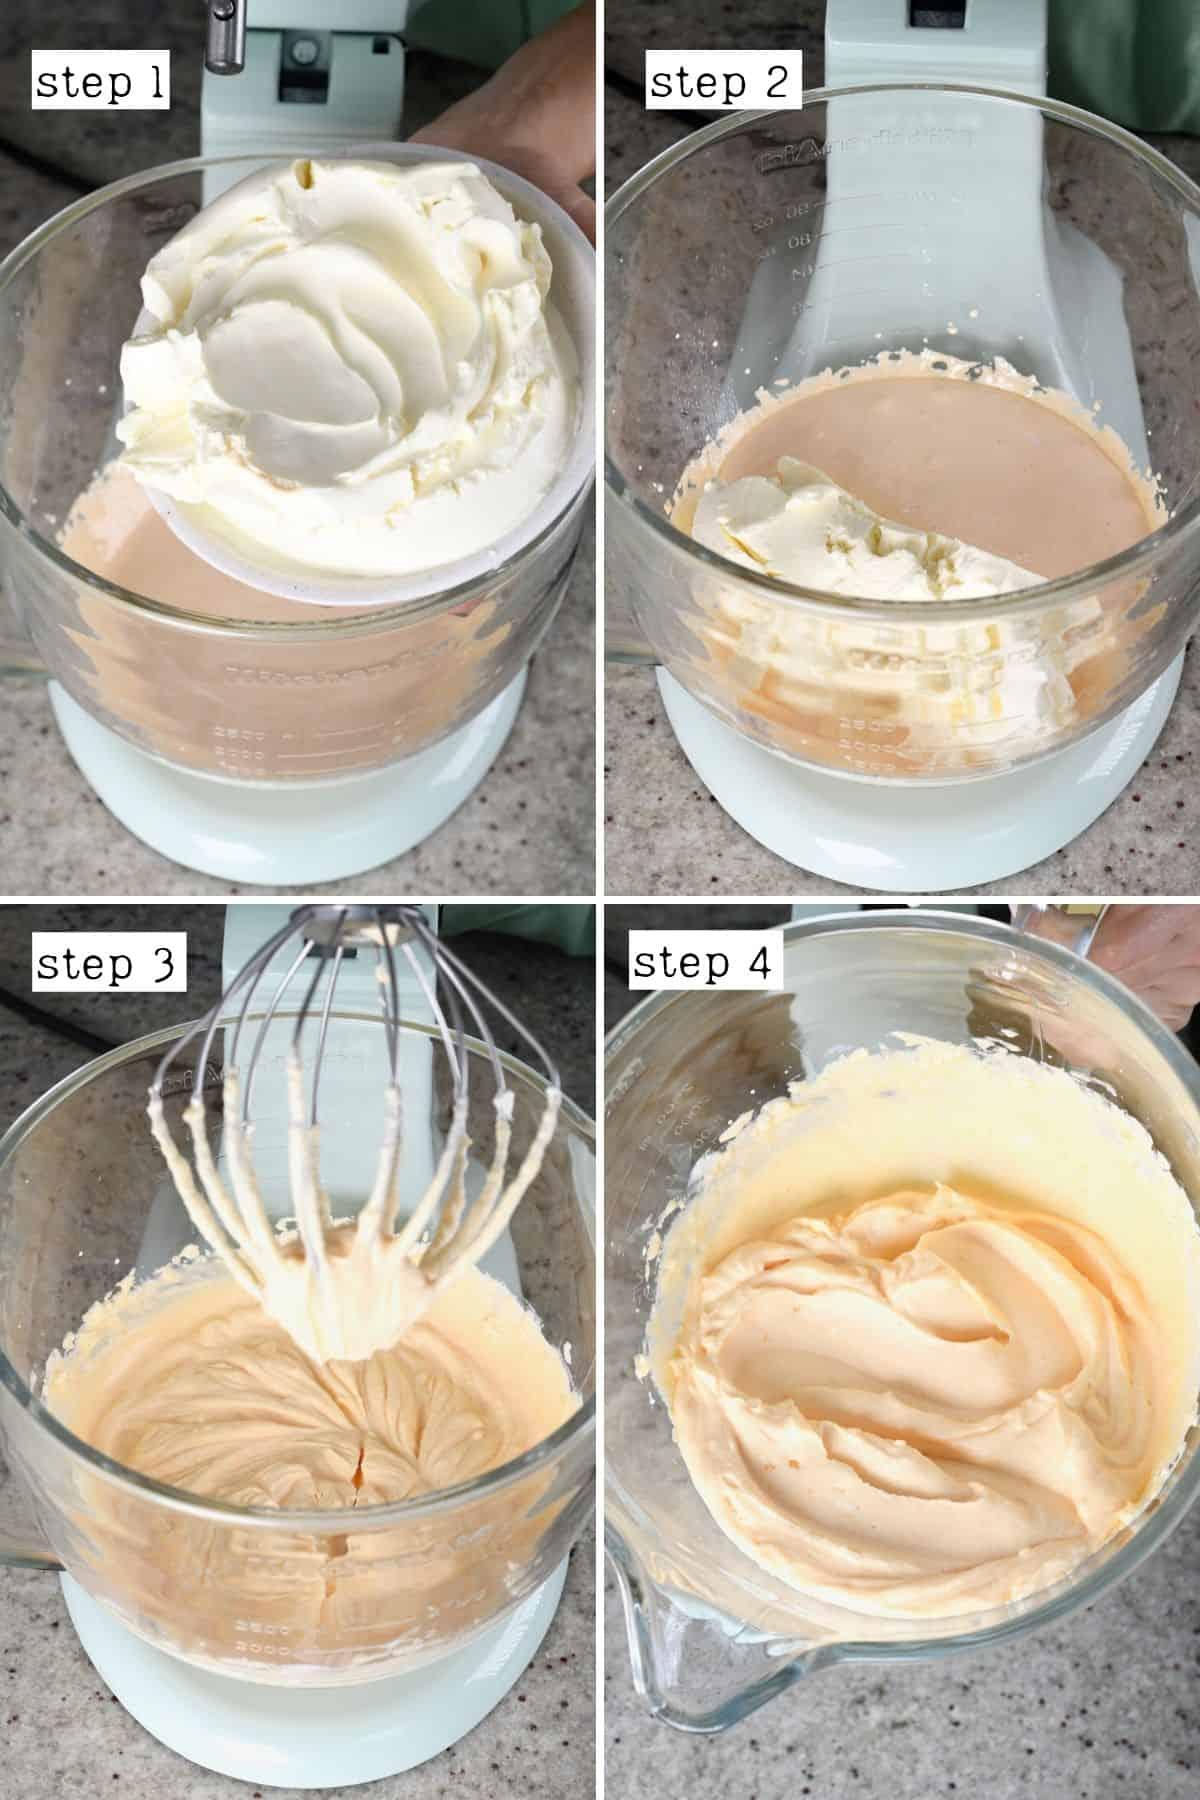 Steps for adding mascarpone to egg sugar mixture